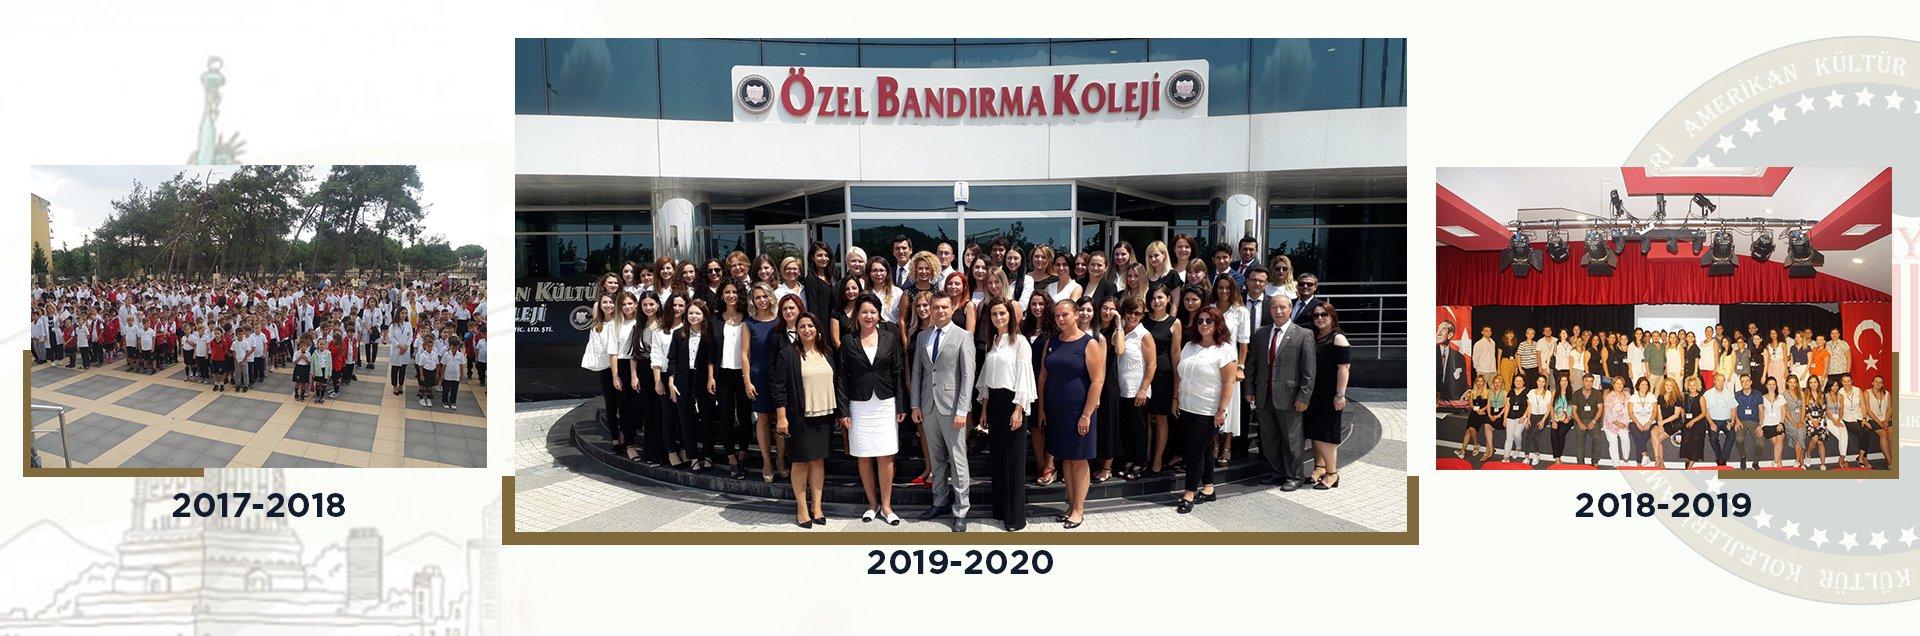 amerikan-kultur-2019-2020-son